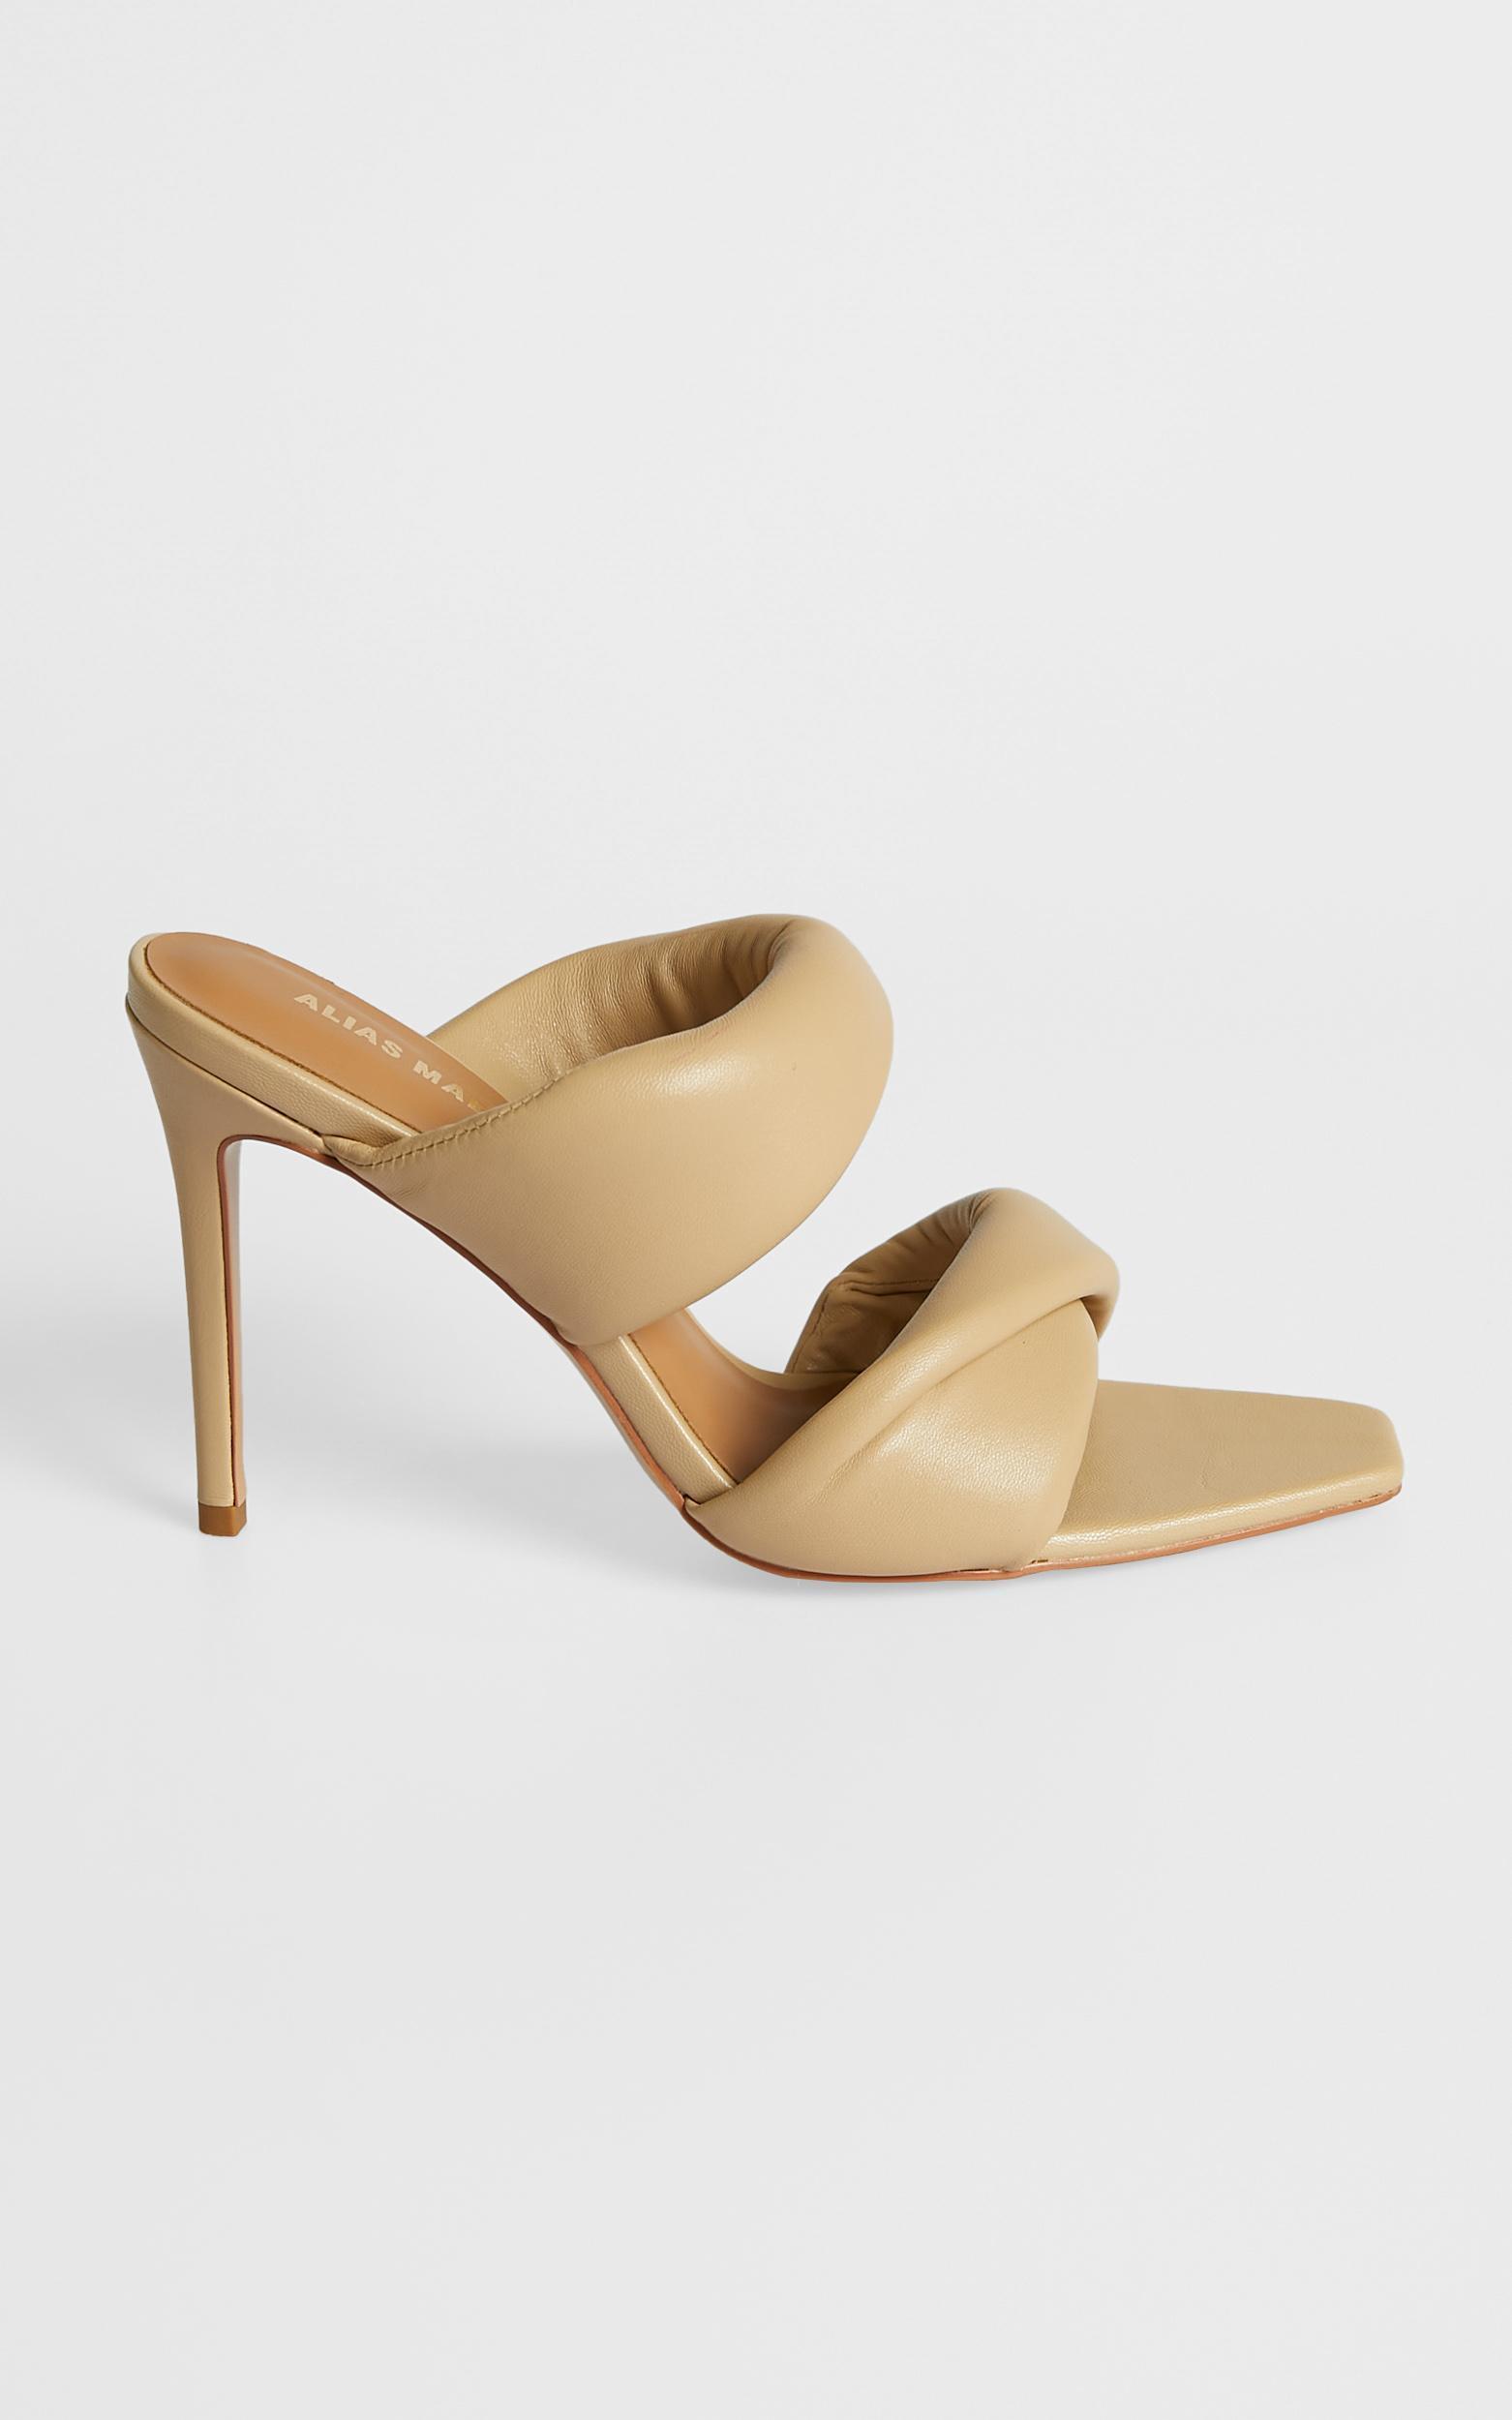 Alias Mae - Issy Heel in Natural Kid Leather - 5.5, Beige, hi-res image number null